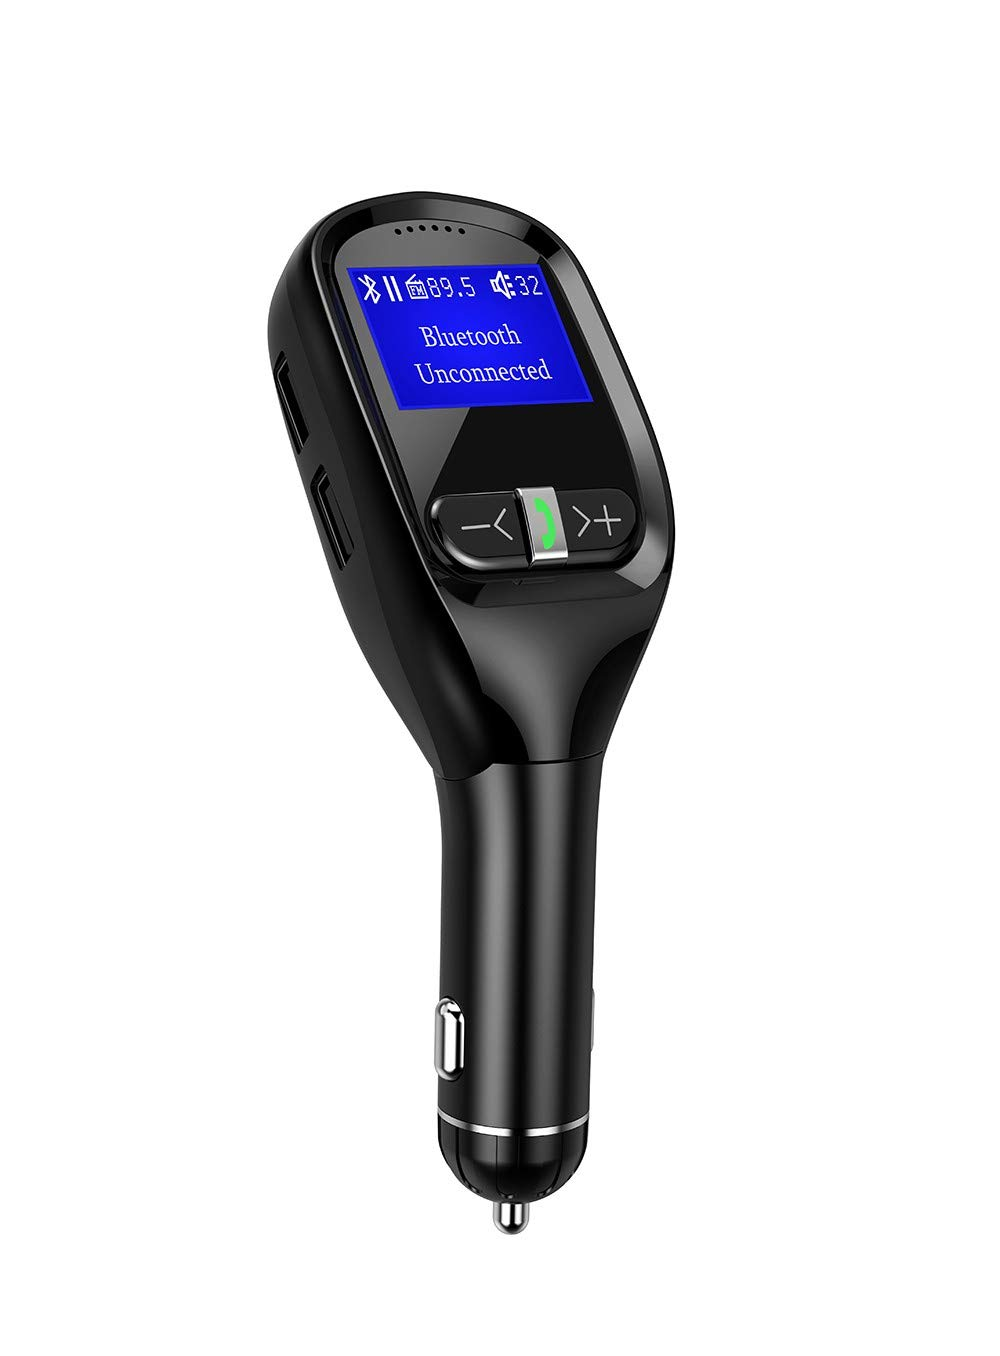 ZXZXZX Transmisor FM Bluetooth Coche Pantalla Flip Pantalla LCD Llamador Voltaje Bluetooth Coche Transmisor FM Soporte De MP3 Reproductor De MúSica EstéReo Bluetooth